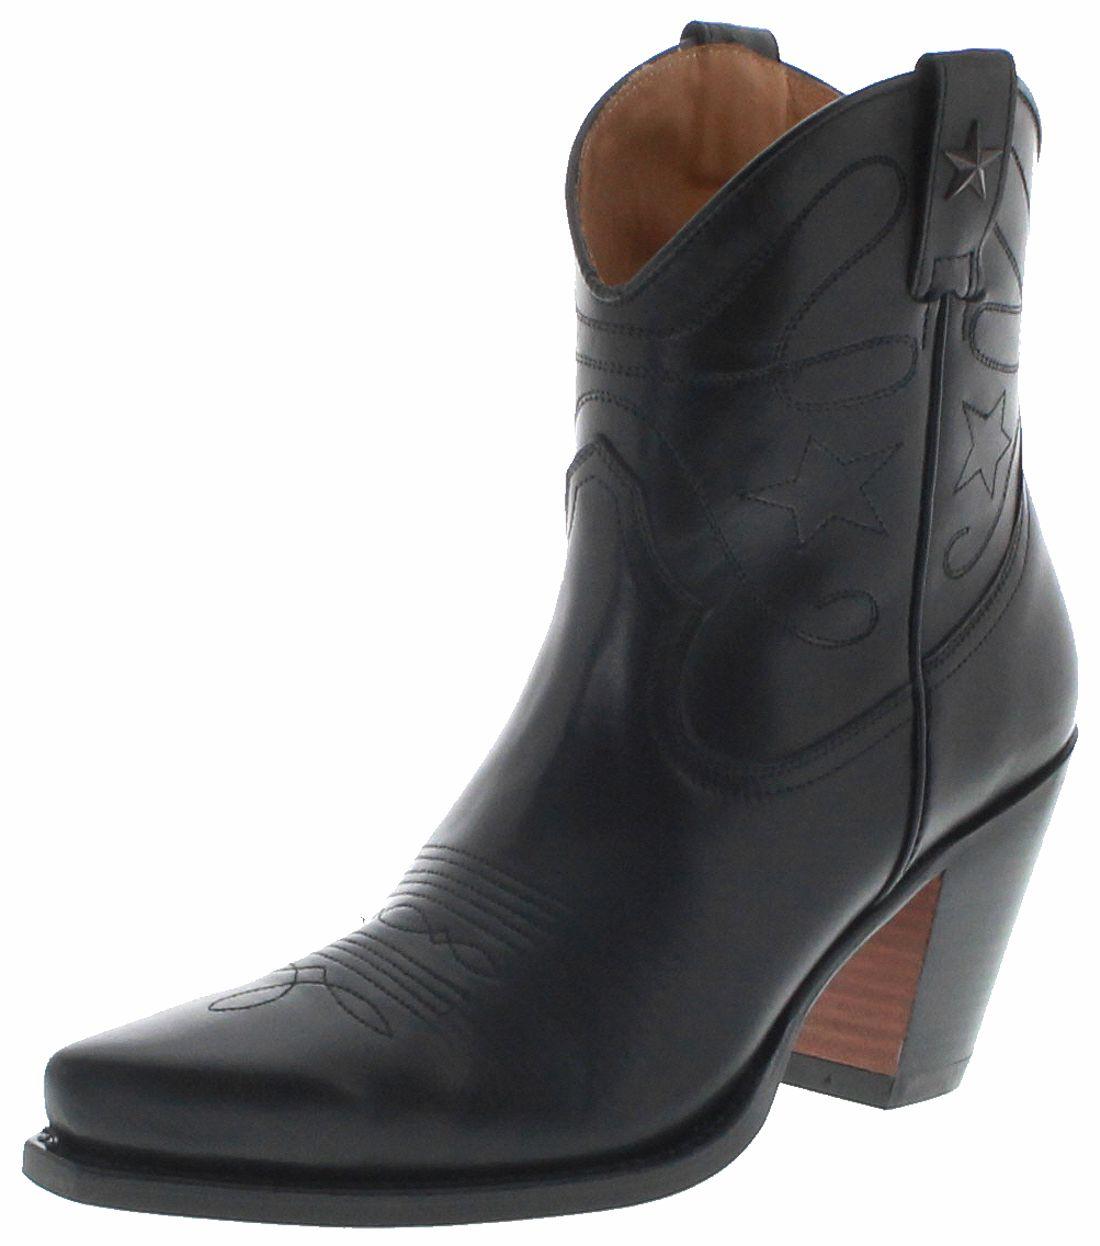 FB Fashion Boots 2498 Negro Ladies Western Bootee - black